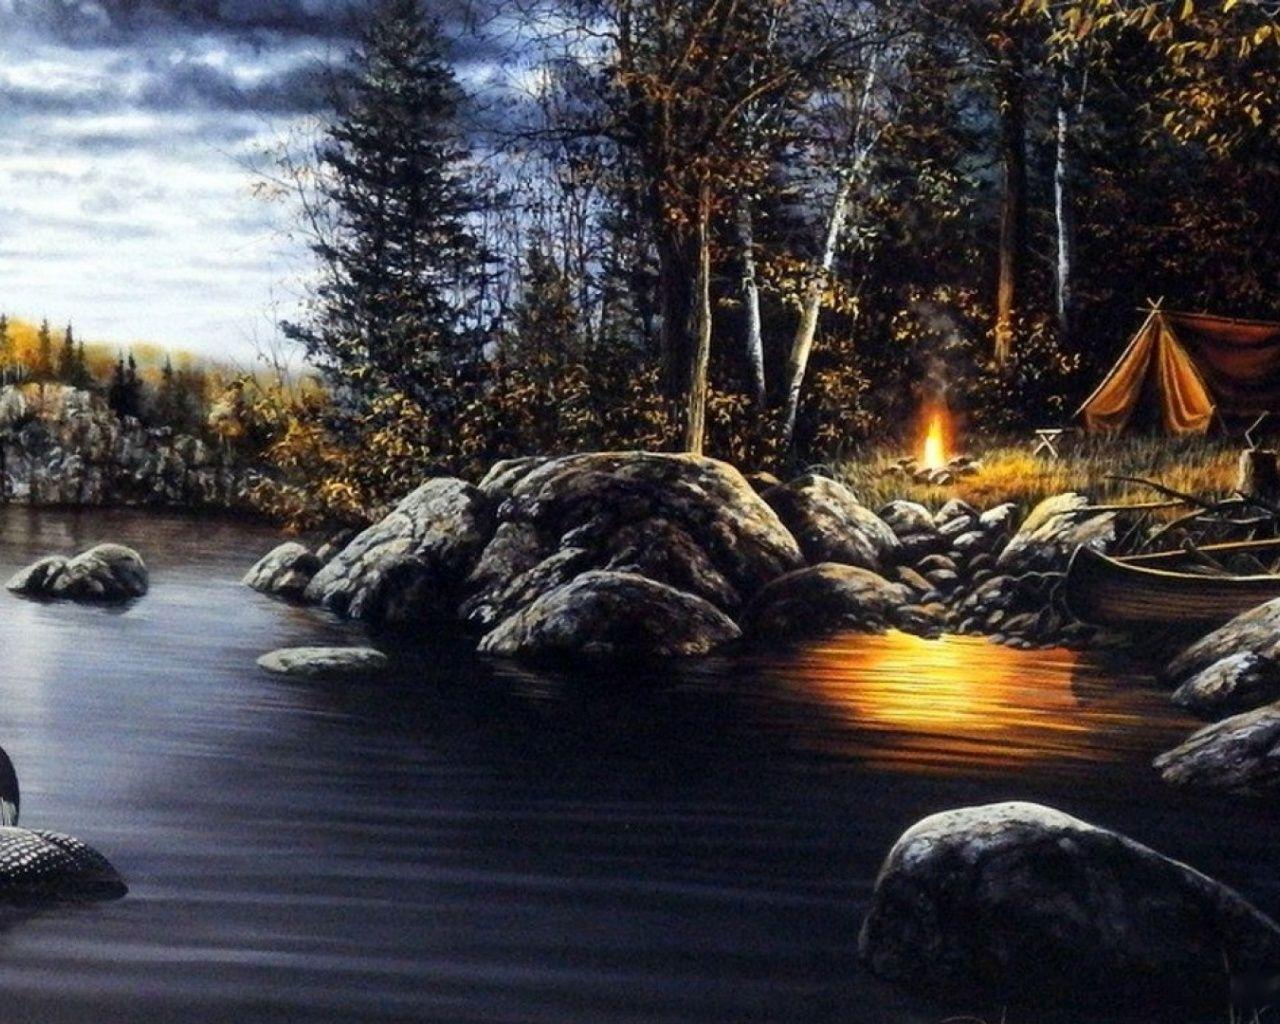 Camping Wallpapers - Wallpaper Cave